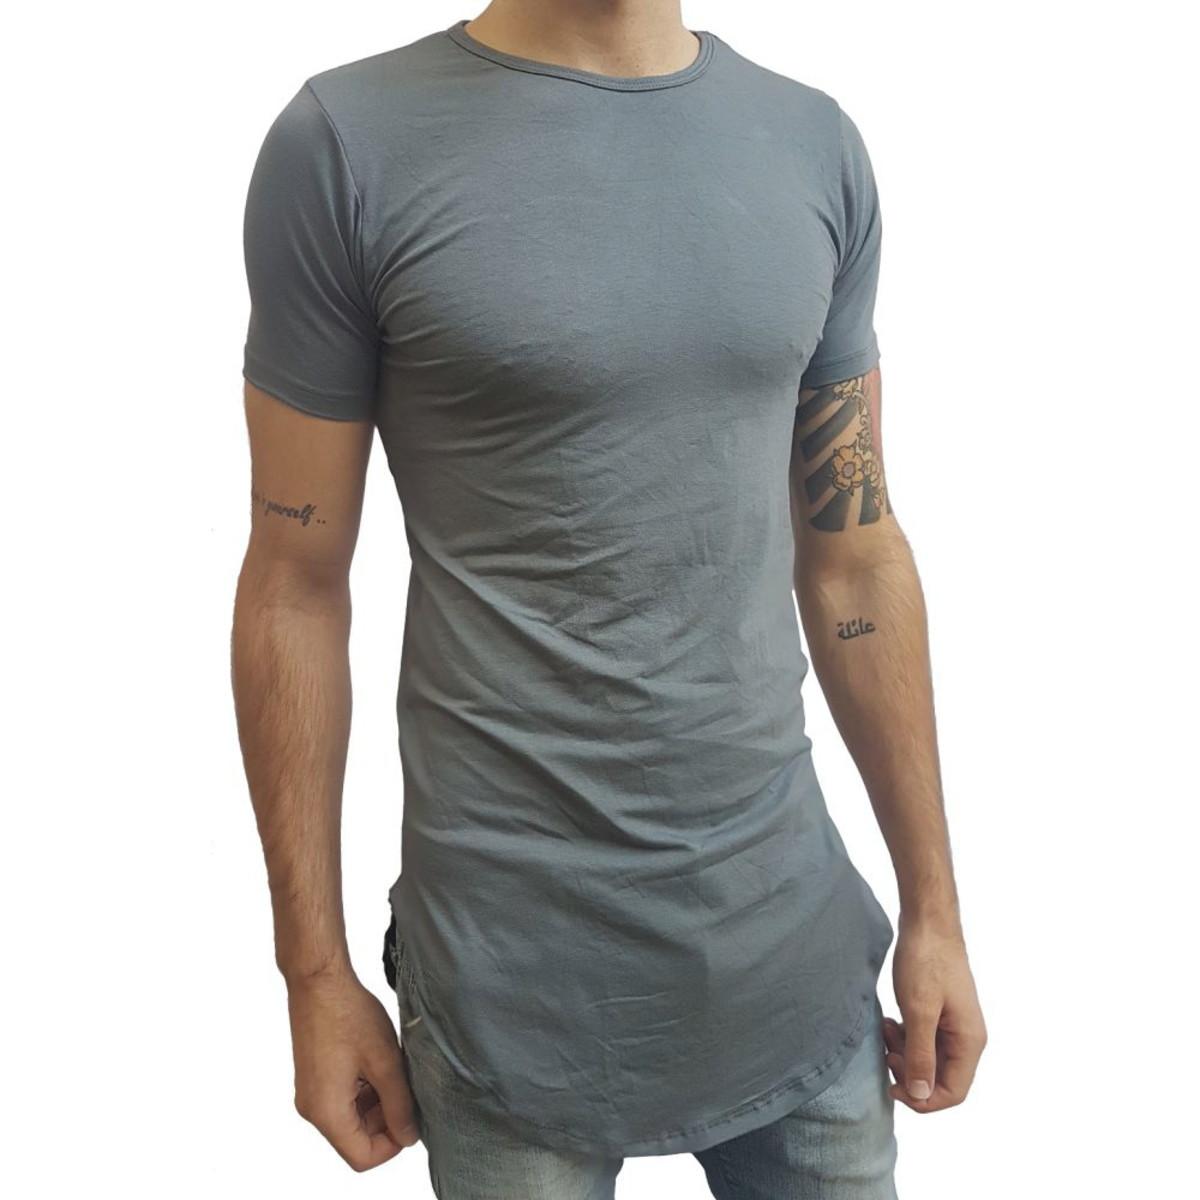 3d2aa10e9e Camiseta Long Masculina Oversized Swag Longline no Elo7